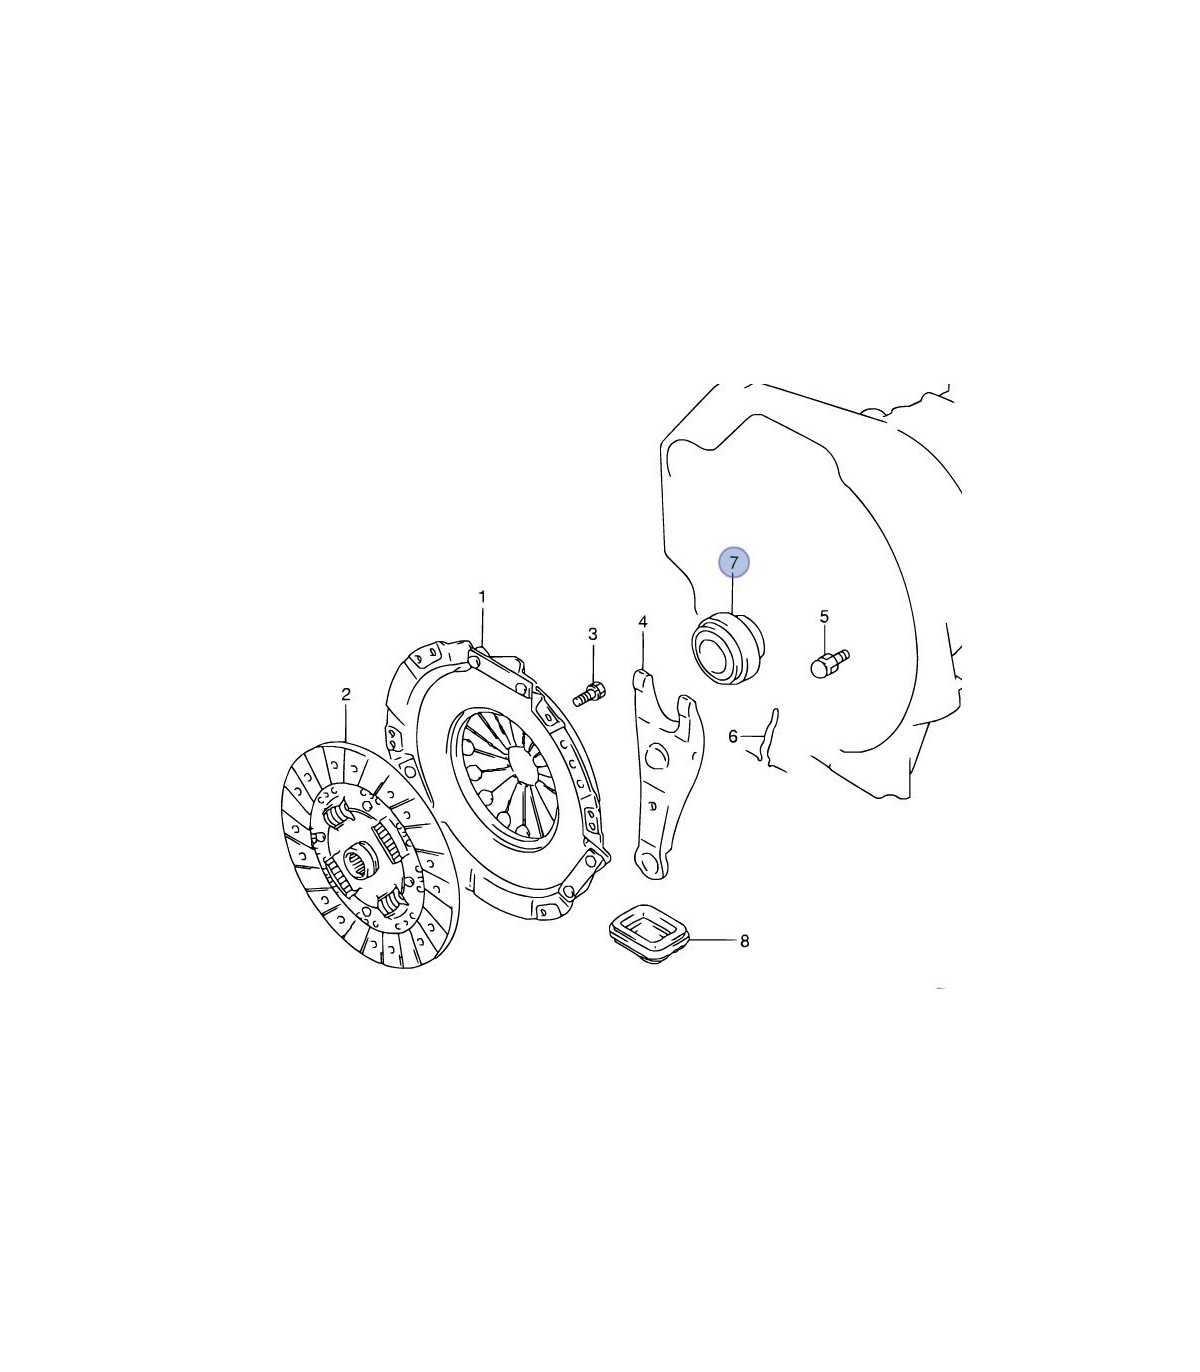 Rodamiento (FCR50-41-2) de embrague TAIWAN